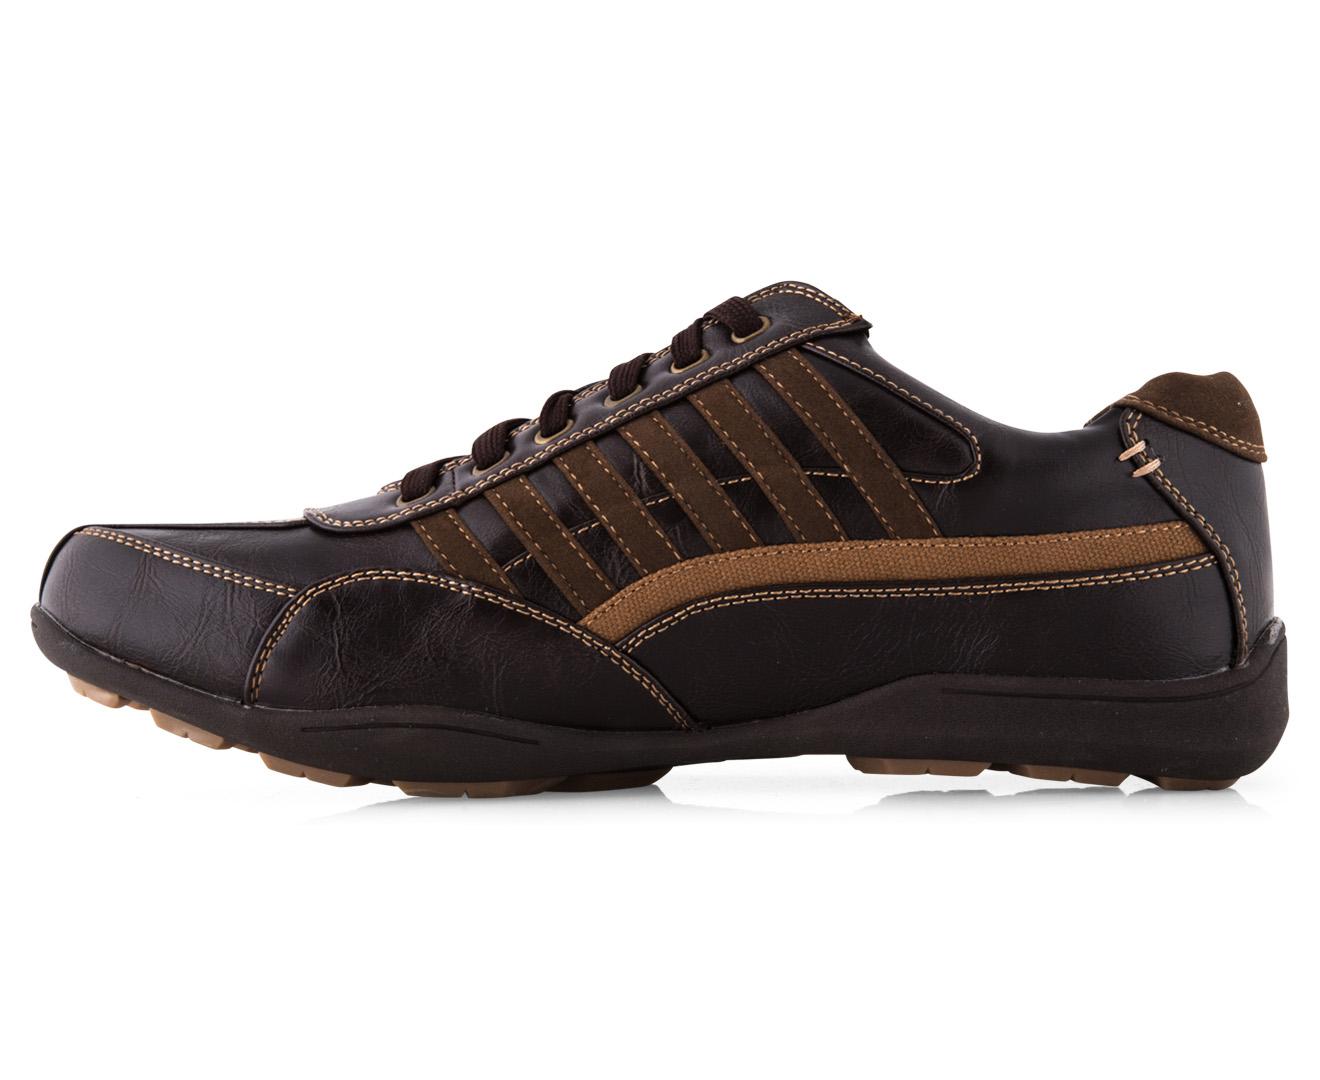 Versatile Affordable Brown Shoes For Men